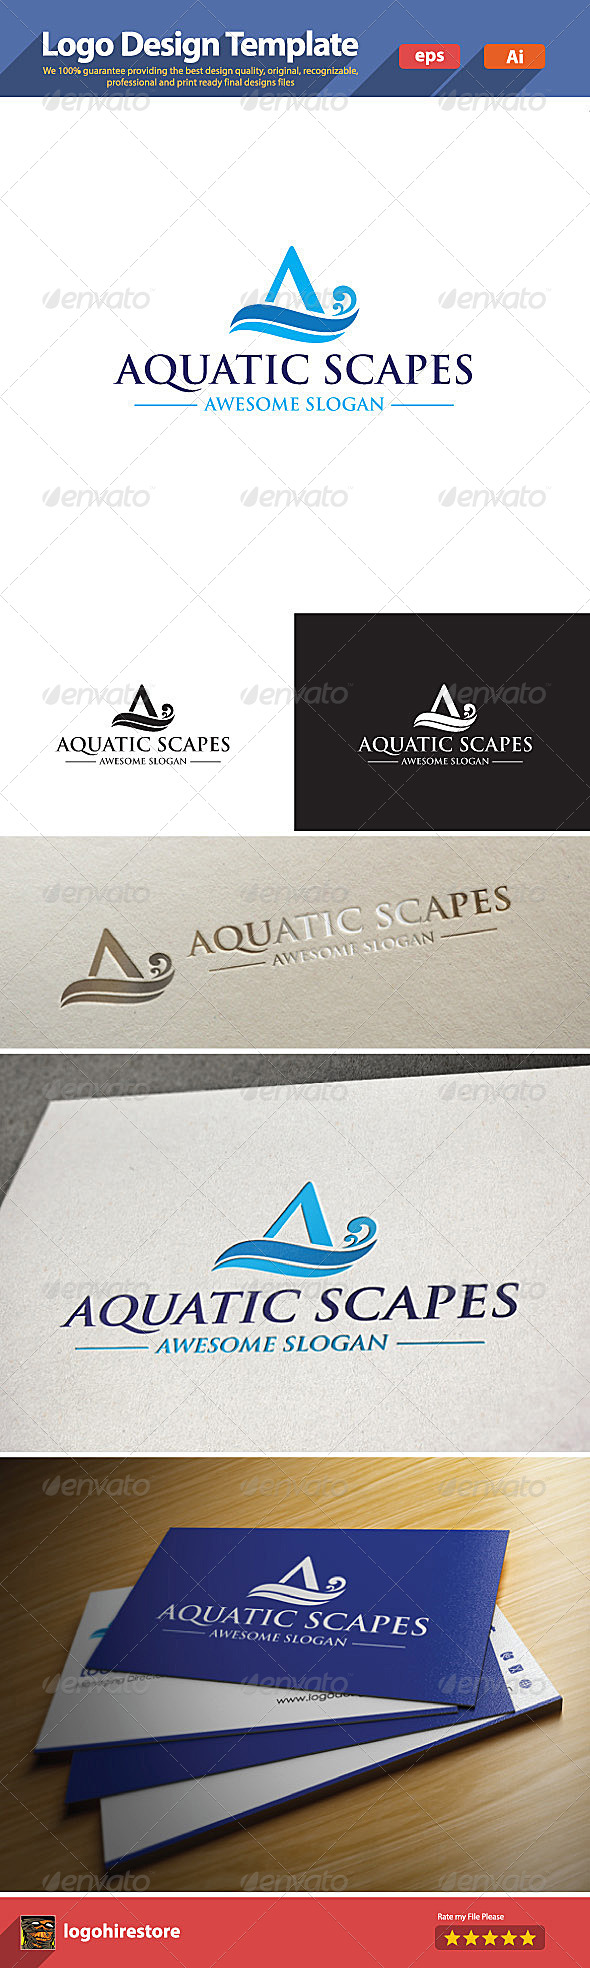 GraphicRiver Aquatic Scapes 6210791